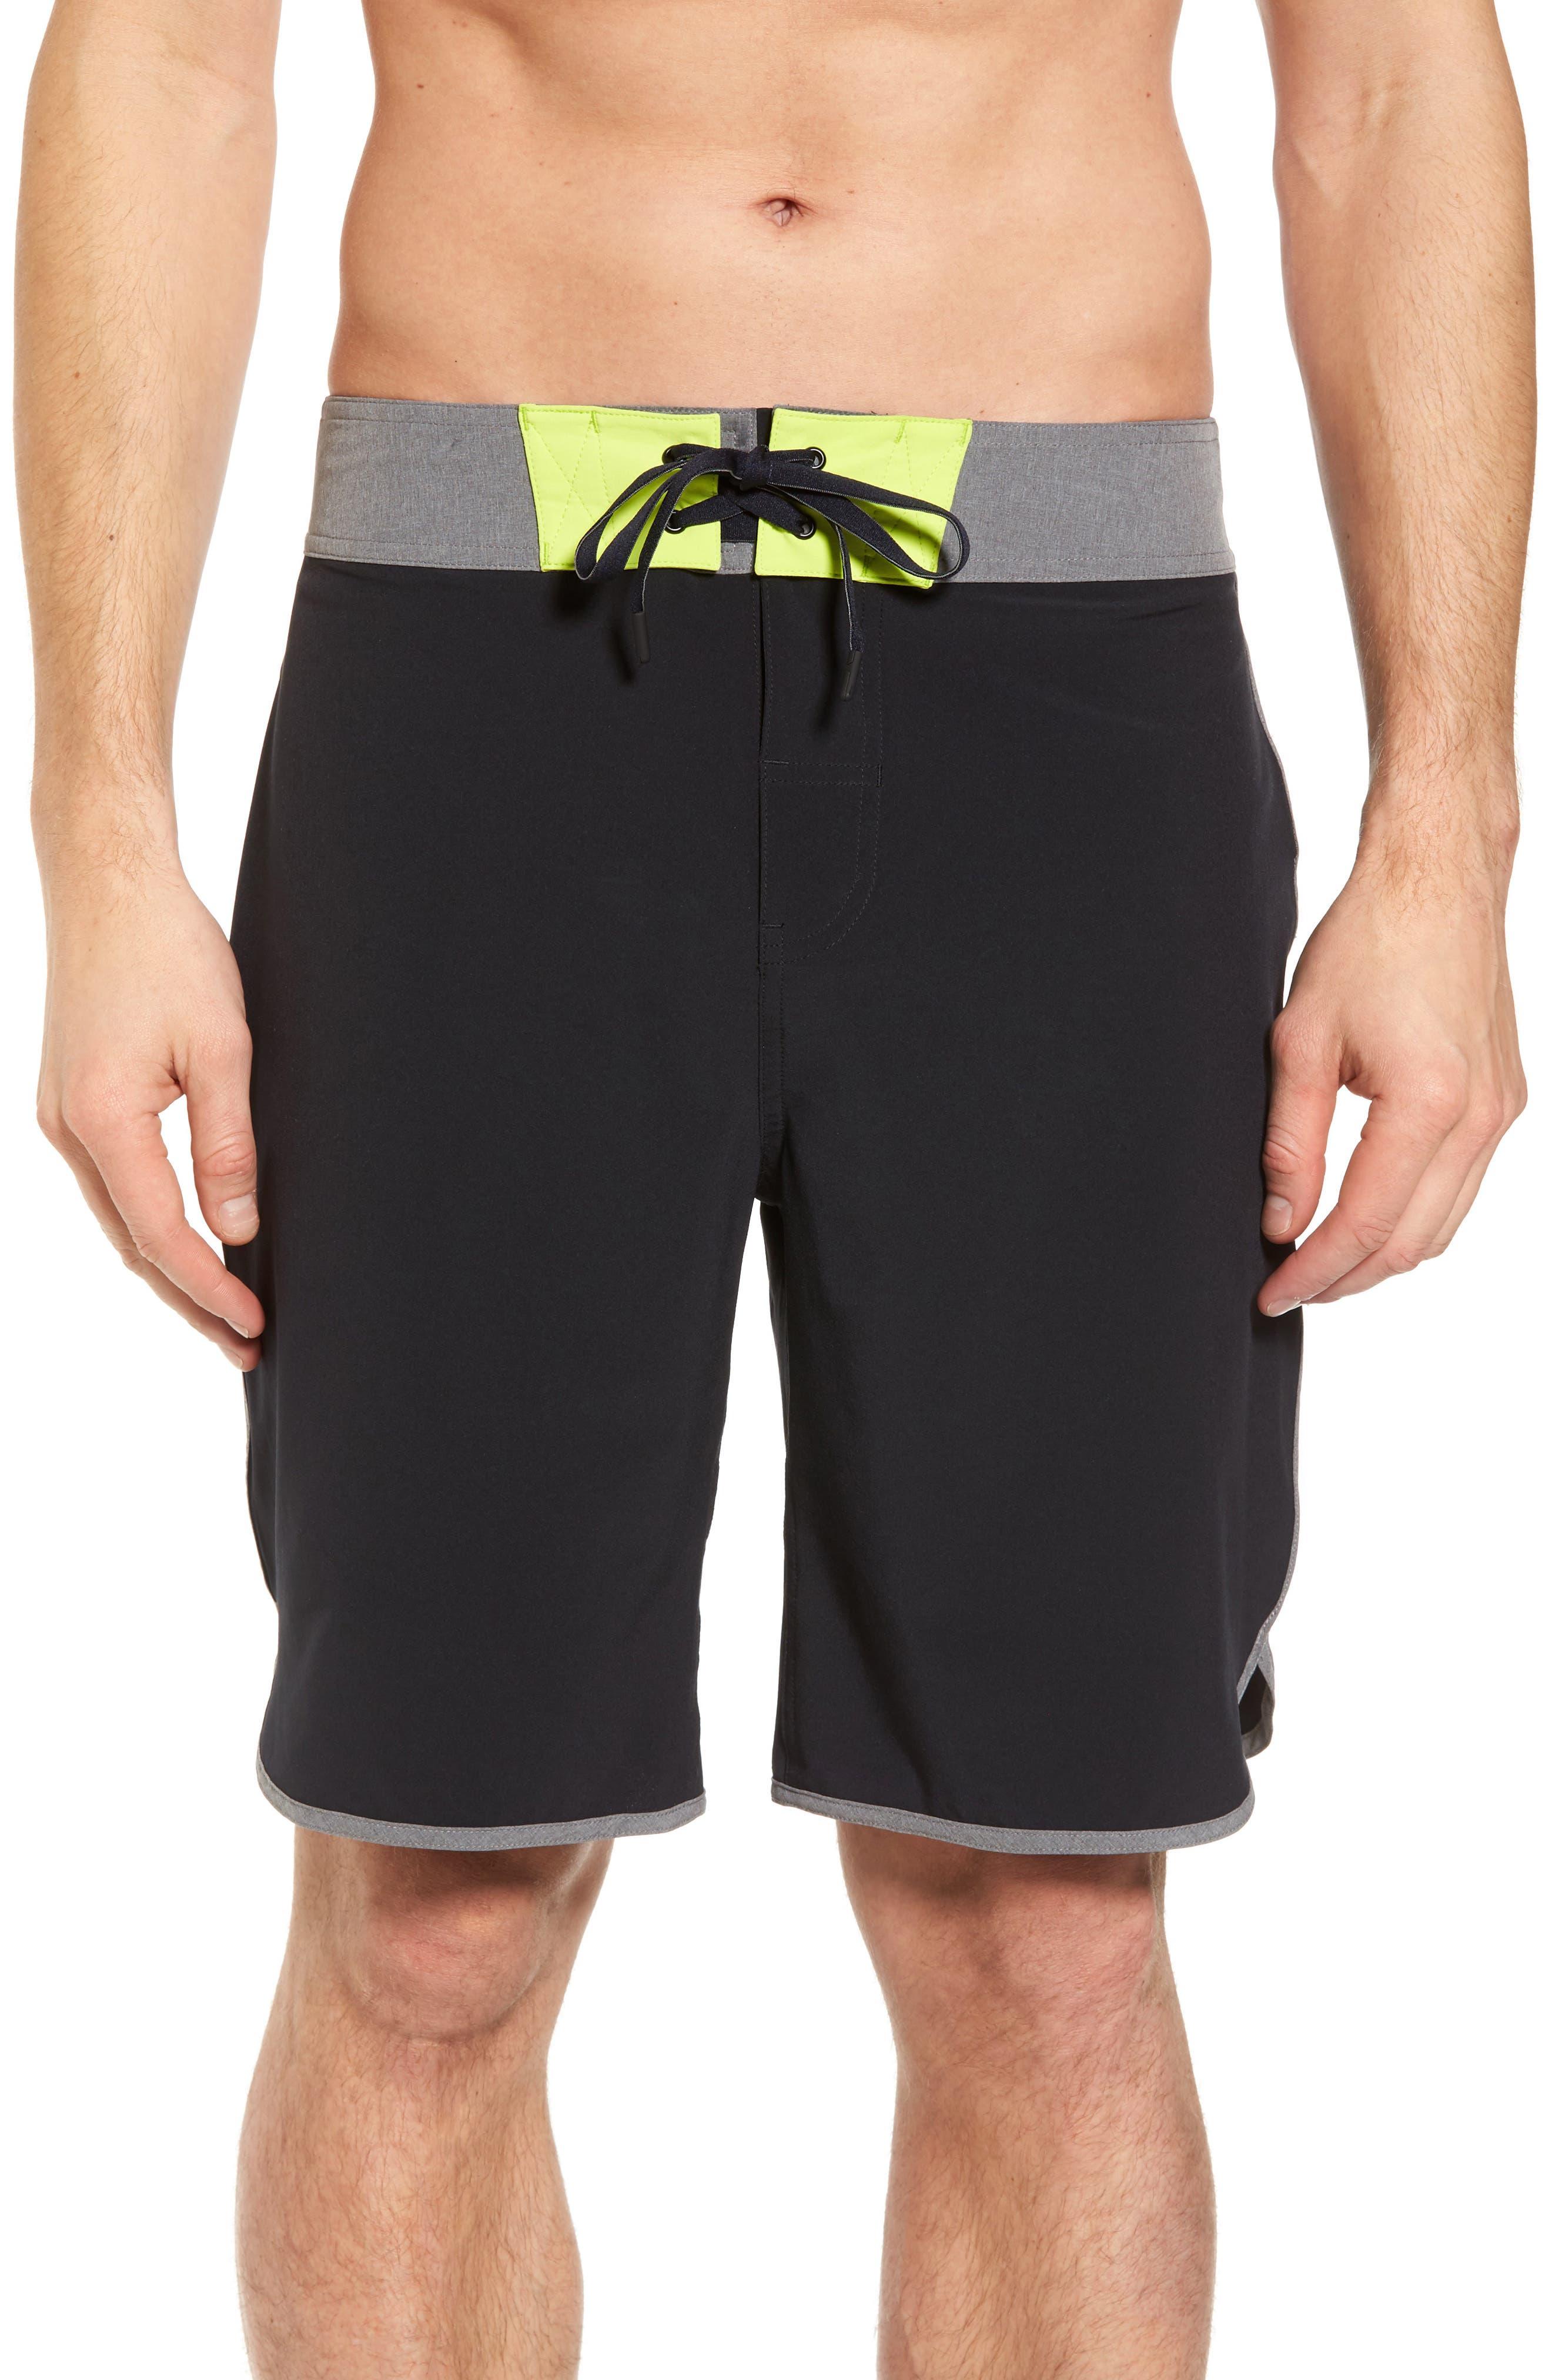 Flex Hybrid Athletic Shorts,                             Main thumbnail 1, color,                             001